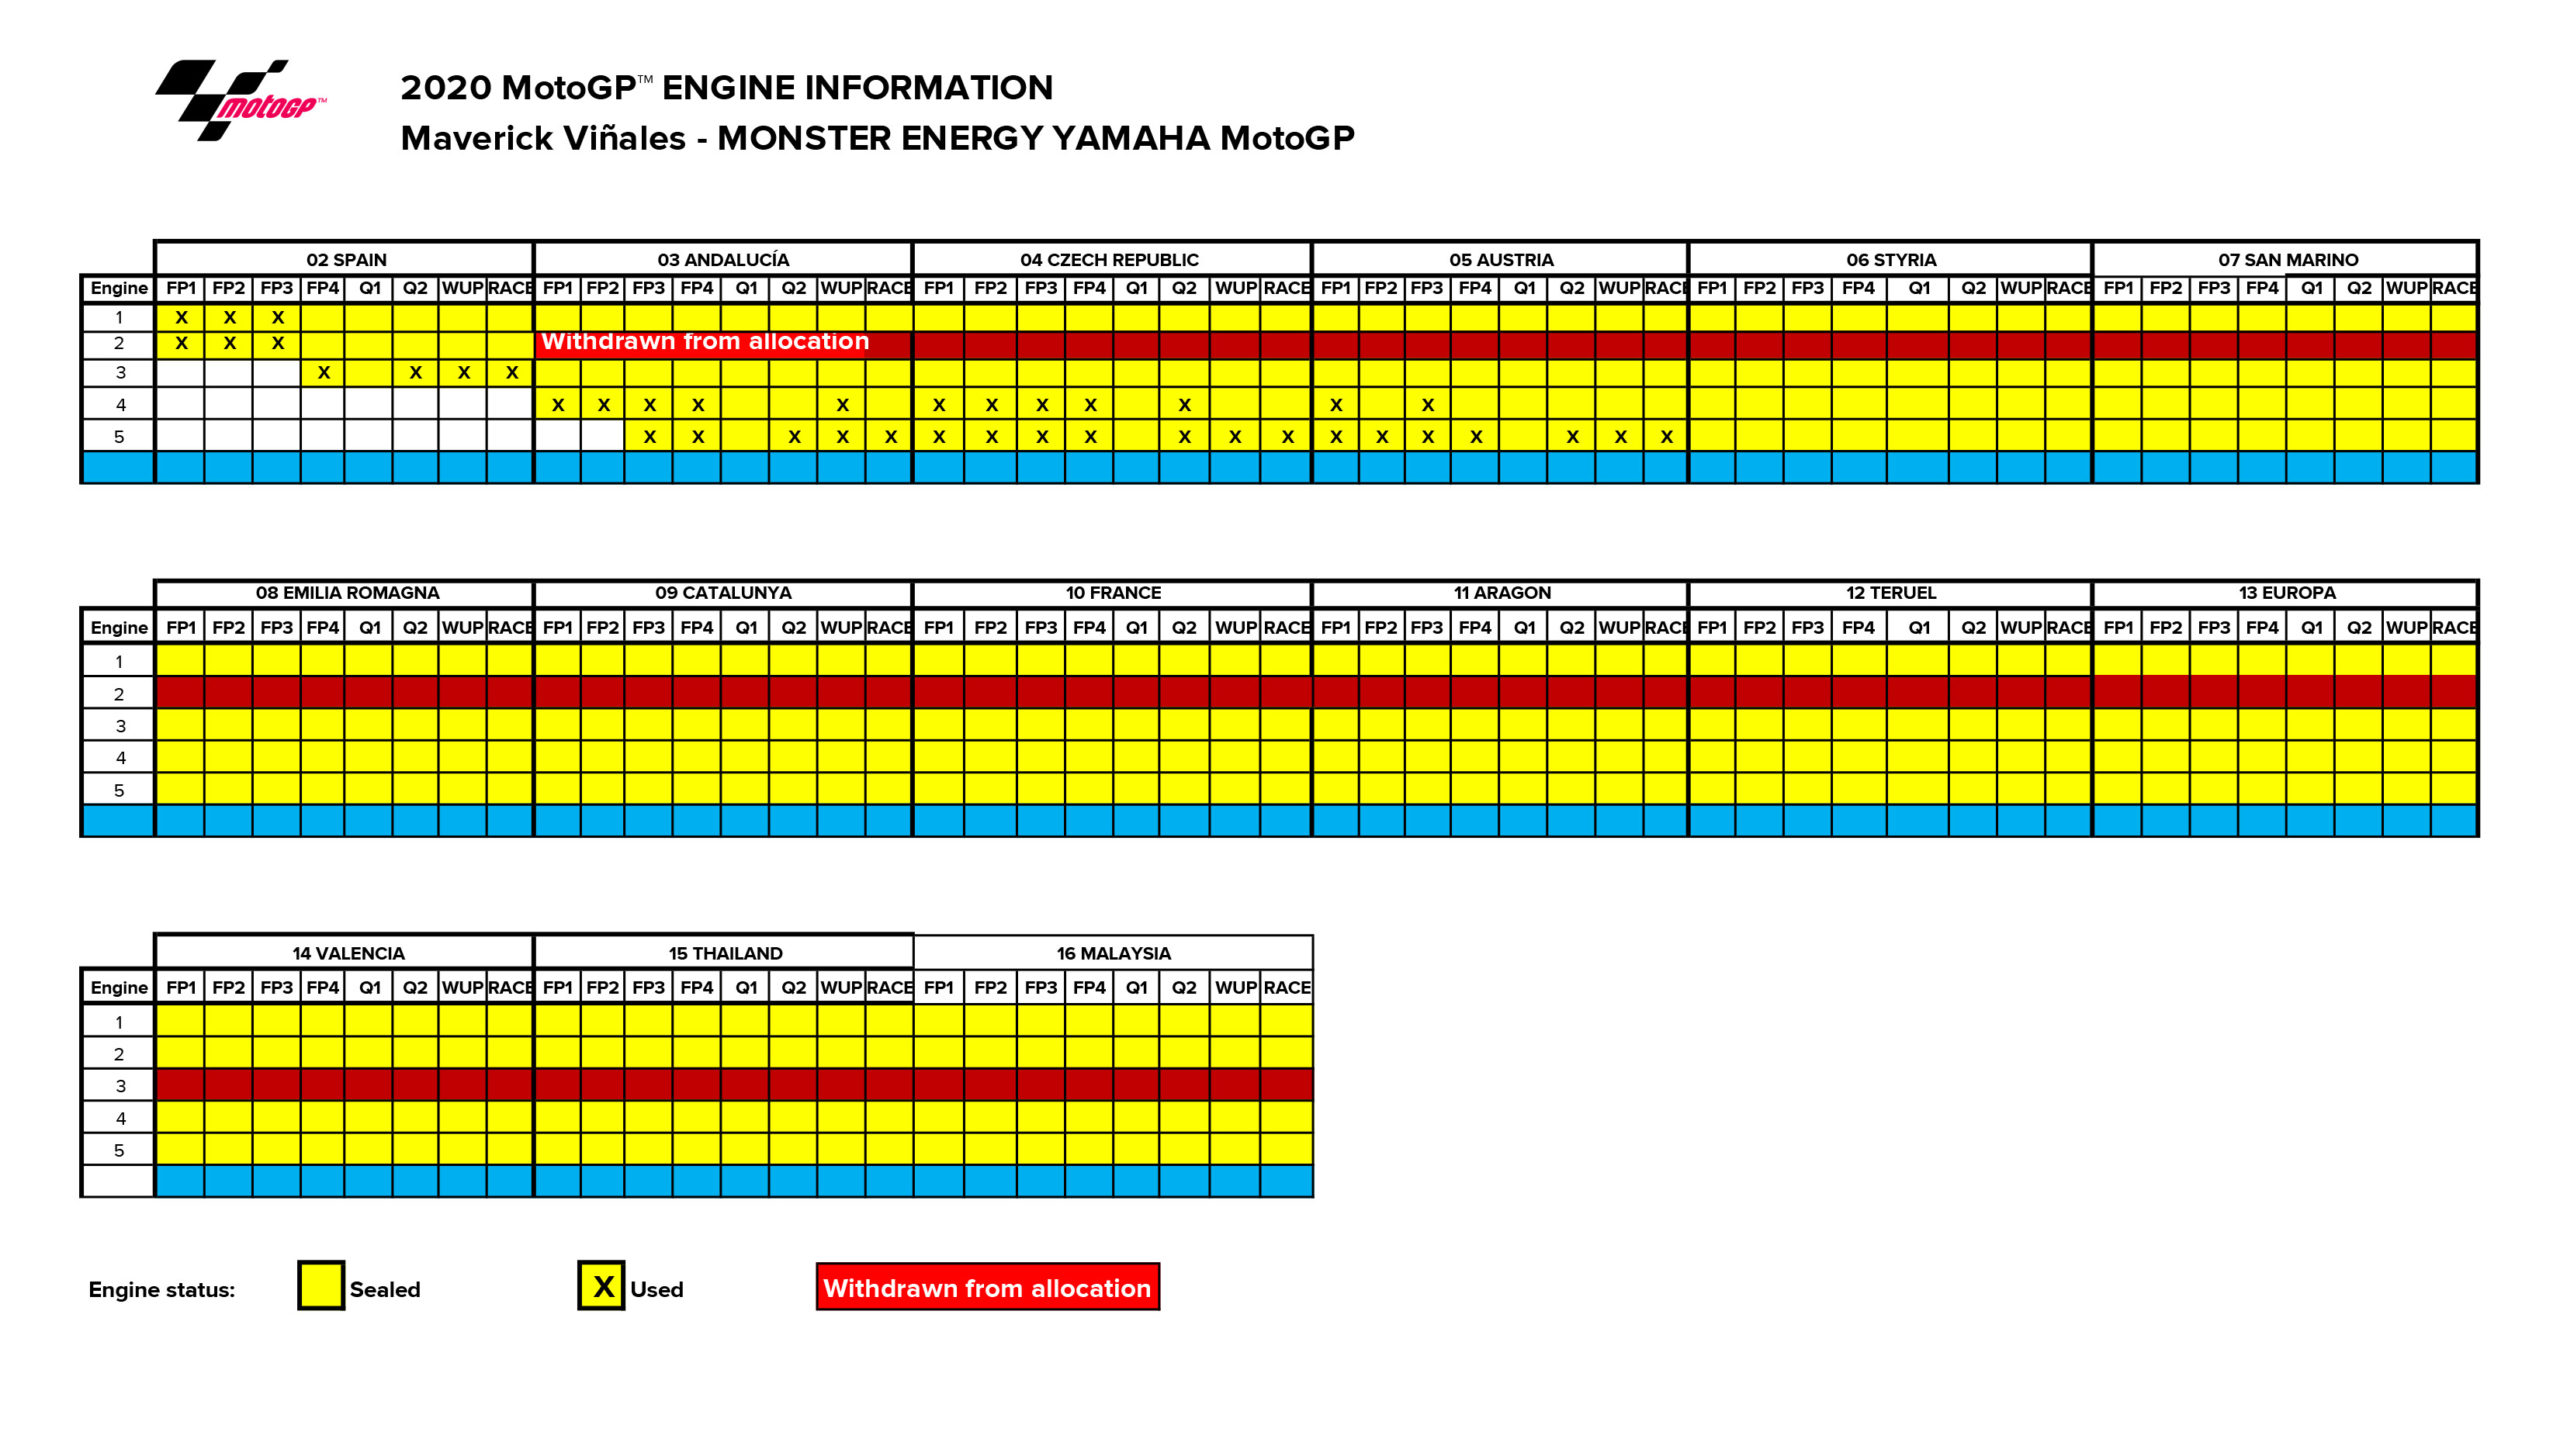 Maverick Vinales engine allocation 2020